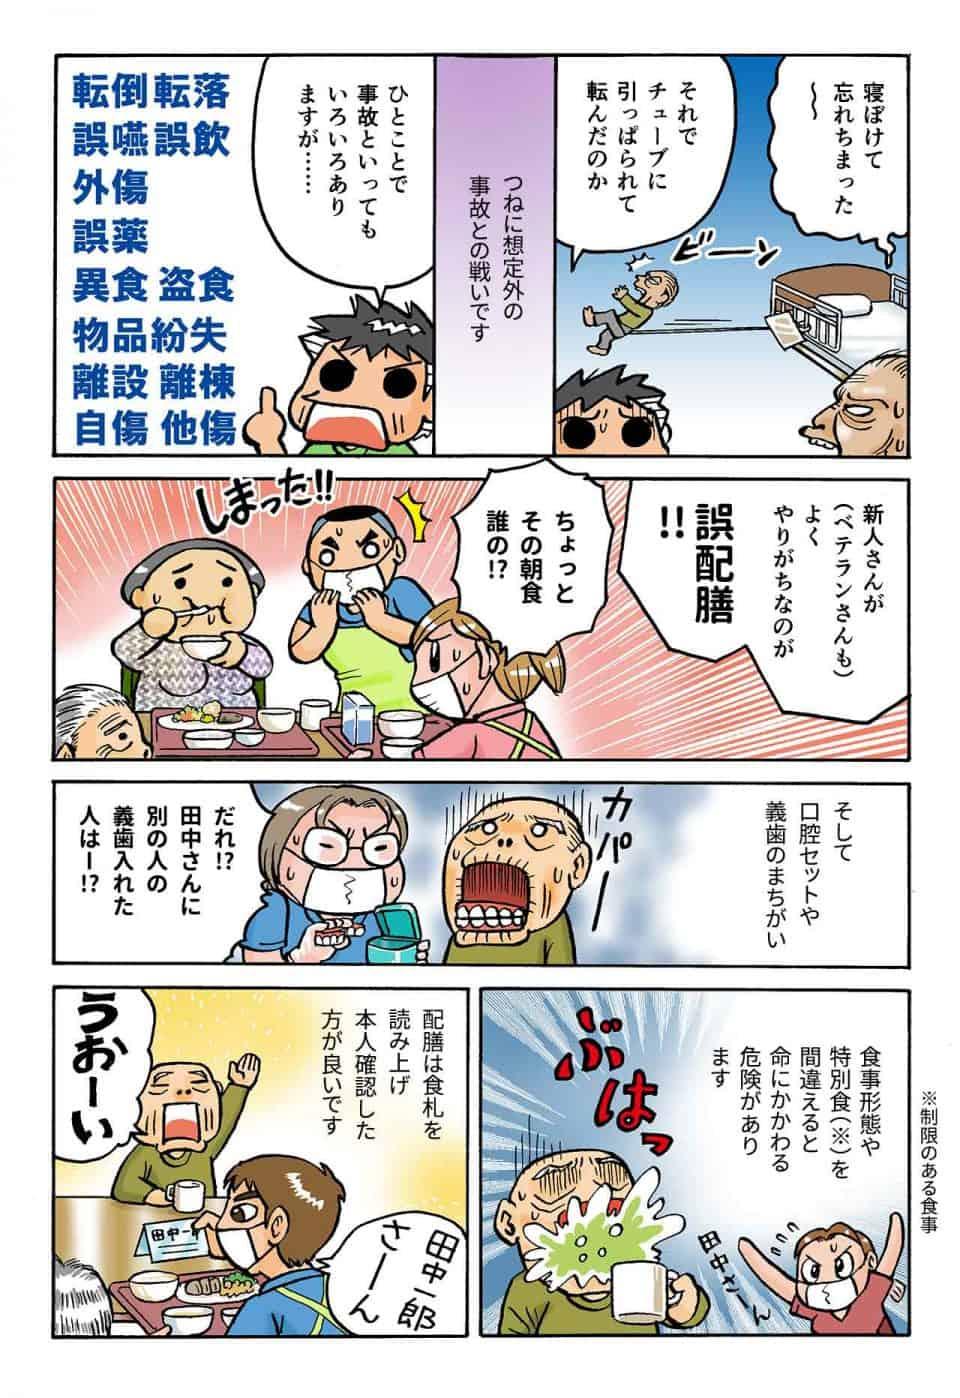 介護施設の事故対応_介護漫画_八万介助_12-2